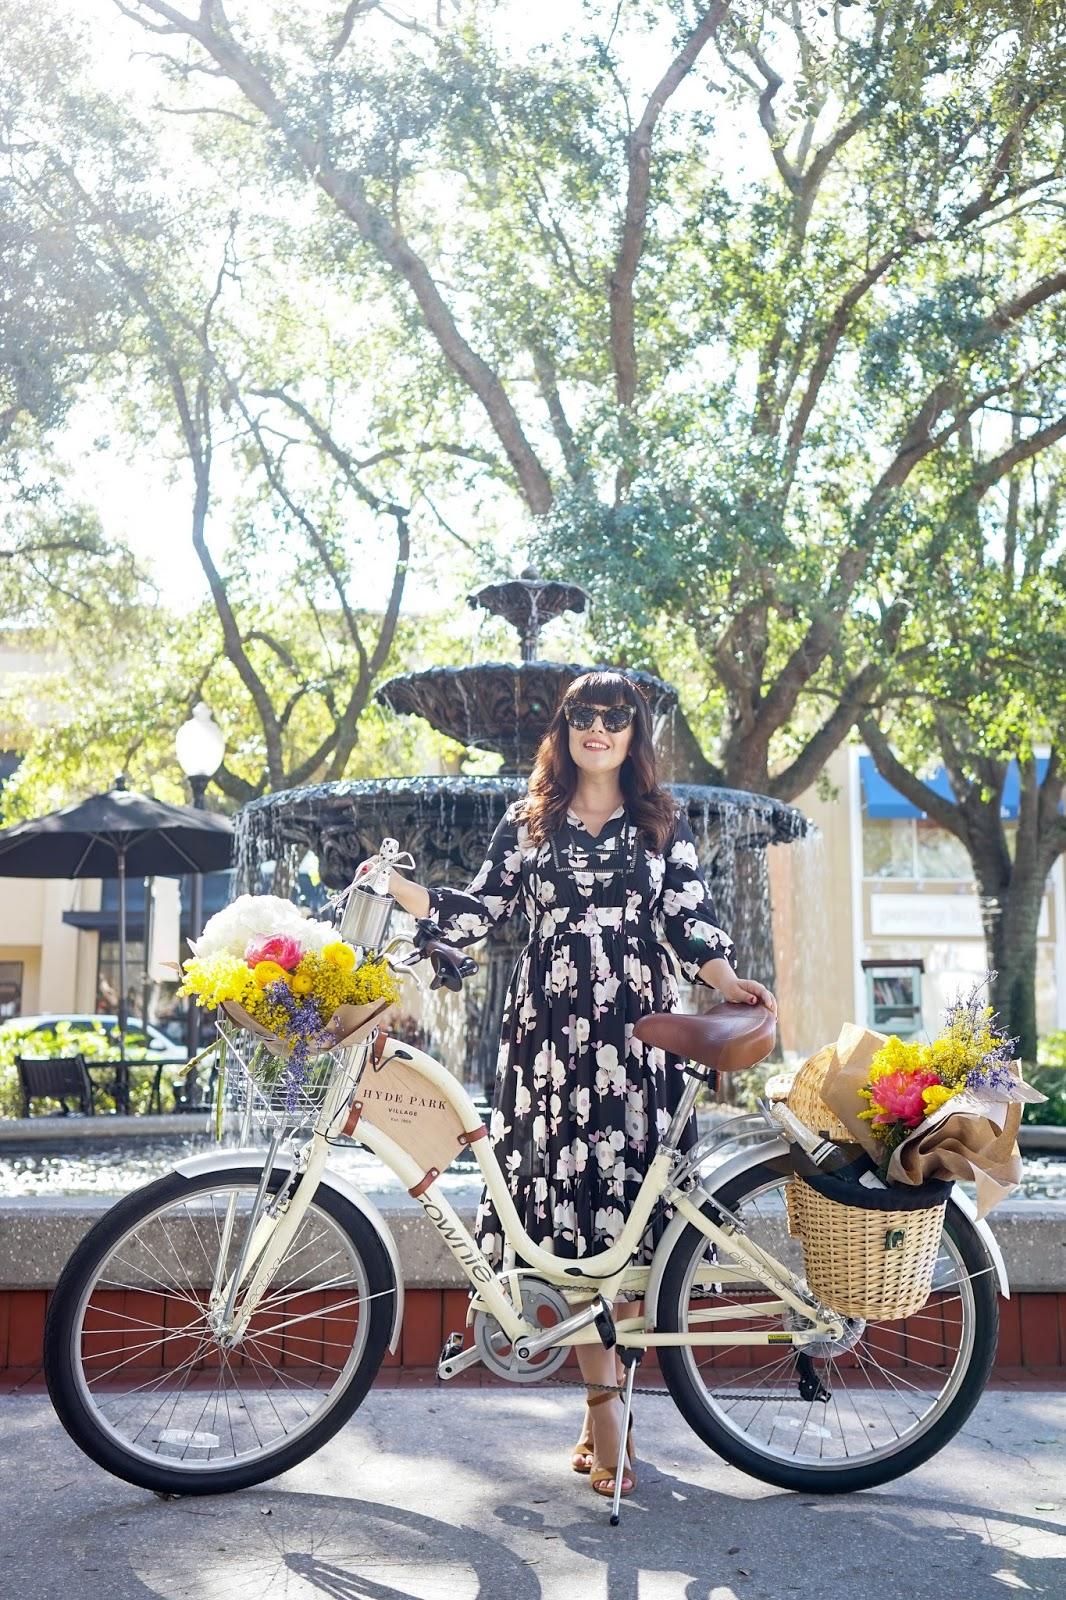 Best Photo Spots in Tampa - Hyde Park Village